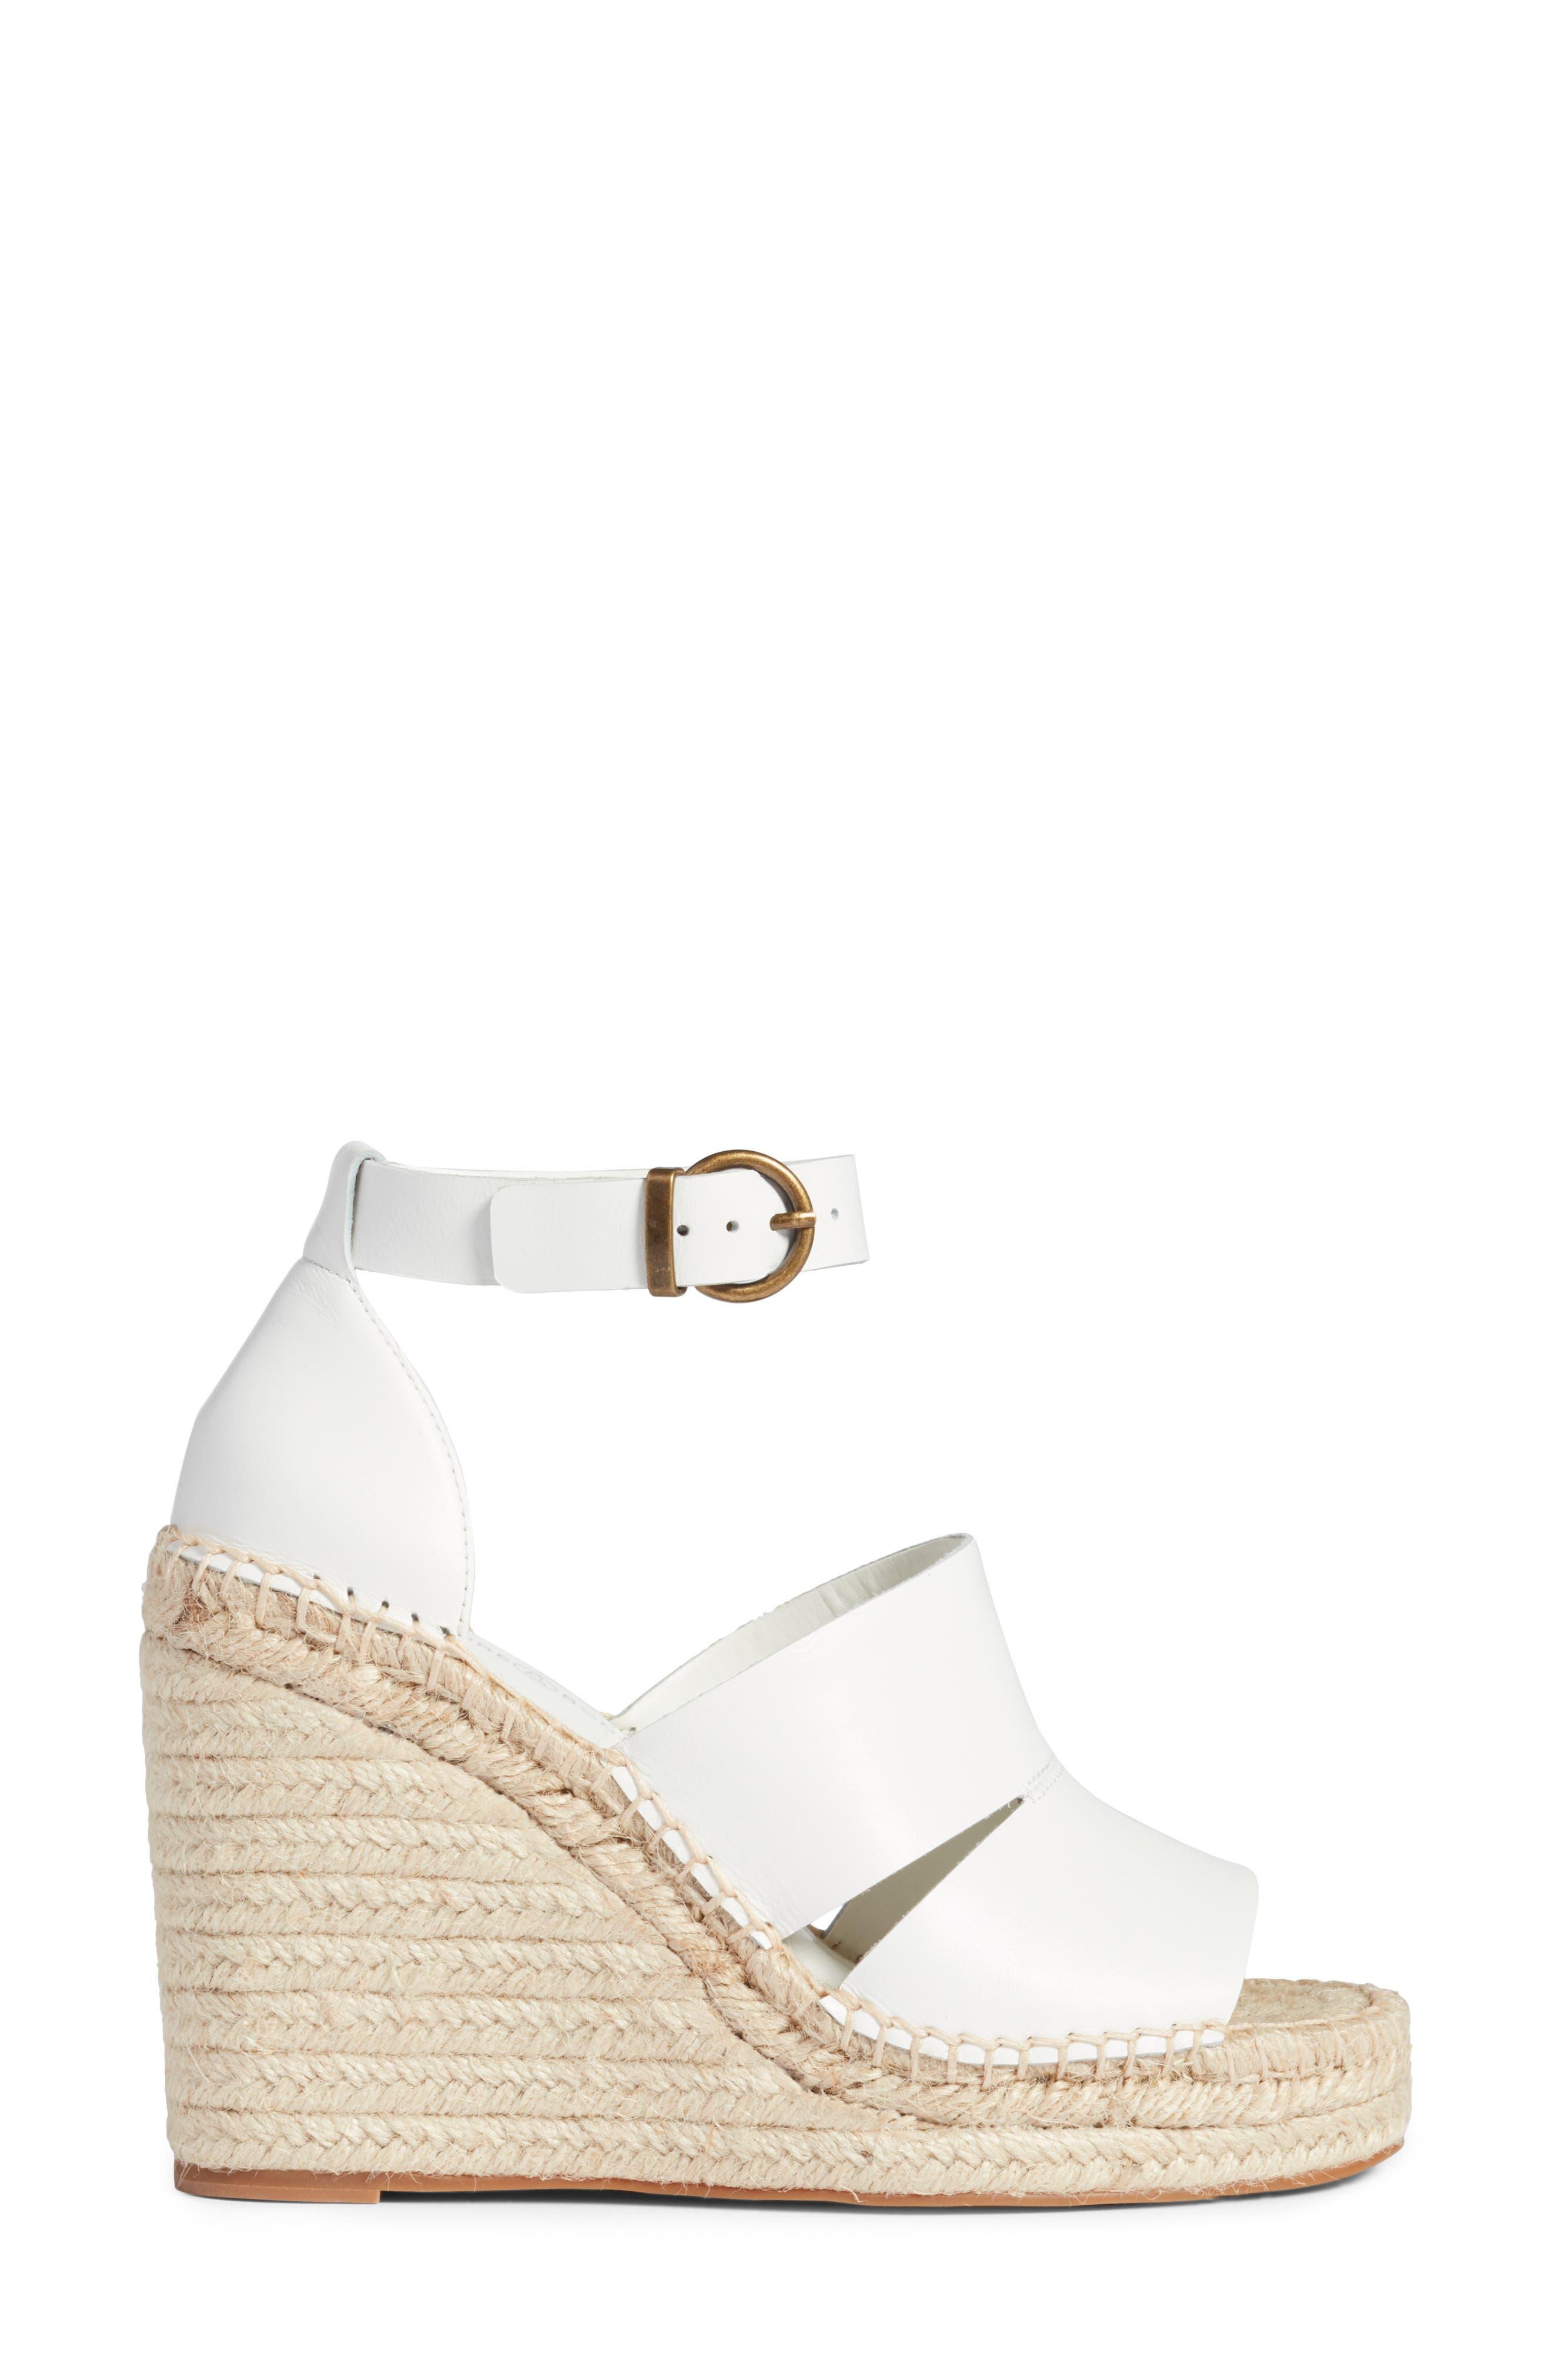 Alternate Image 3  - Treasure & Bond Sannibel Platform Wedge Sandal (Women)